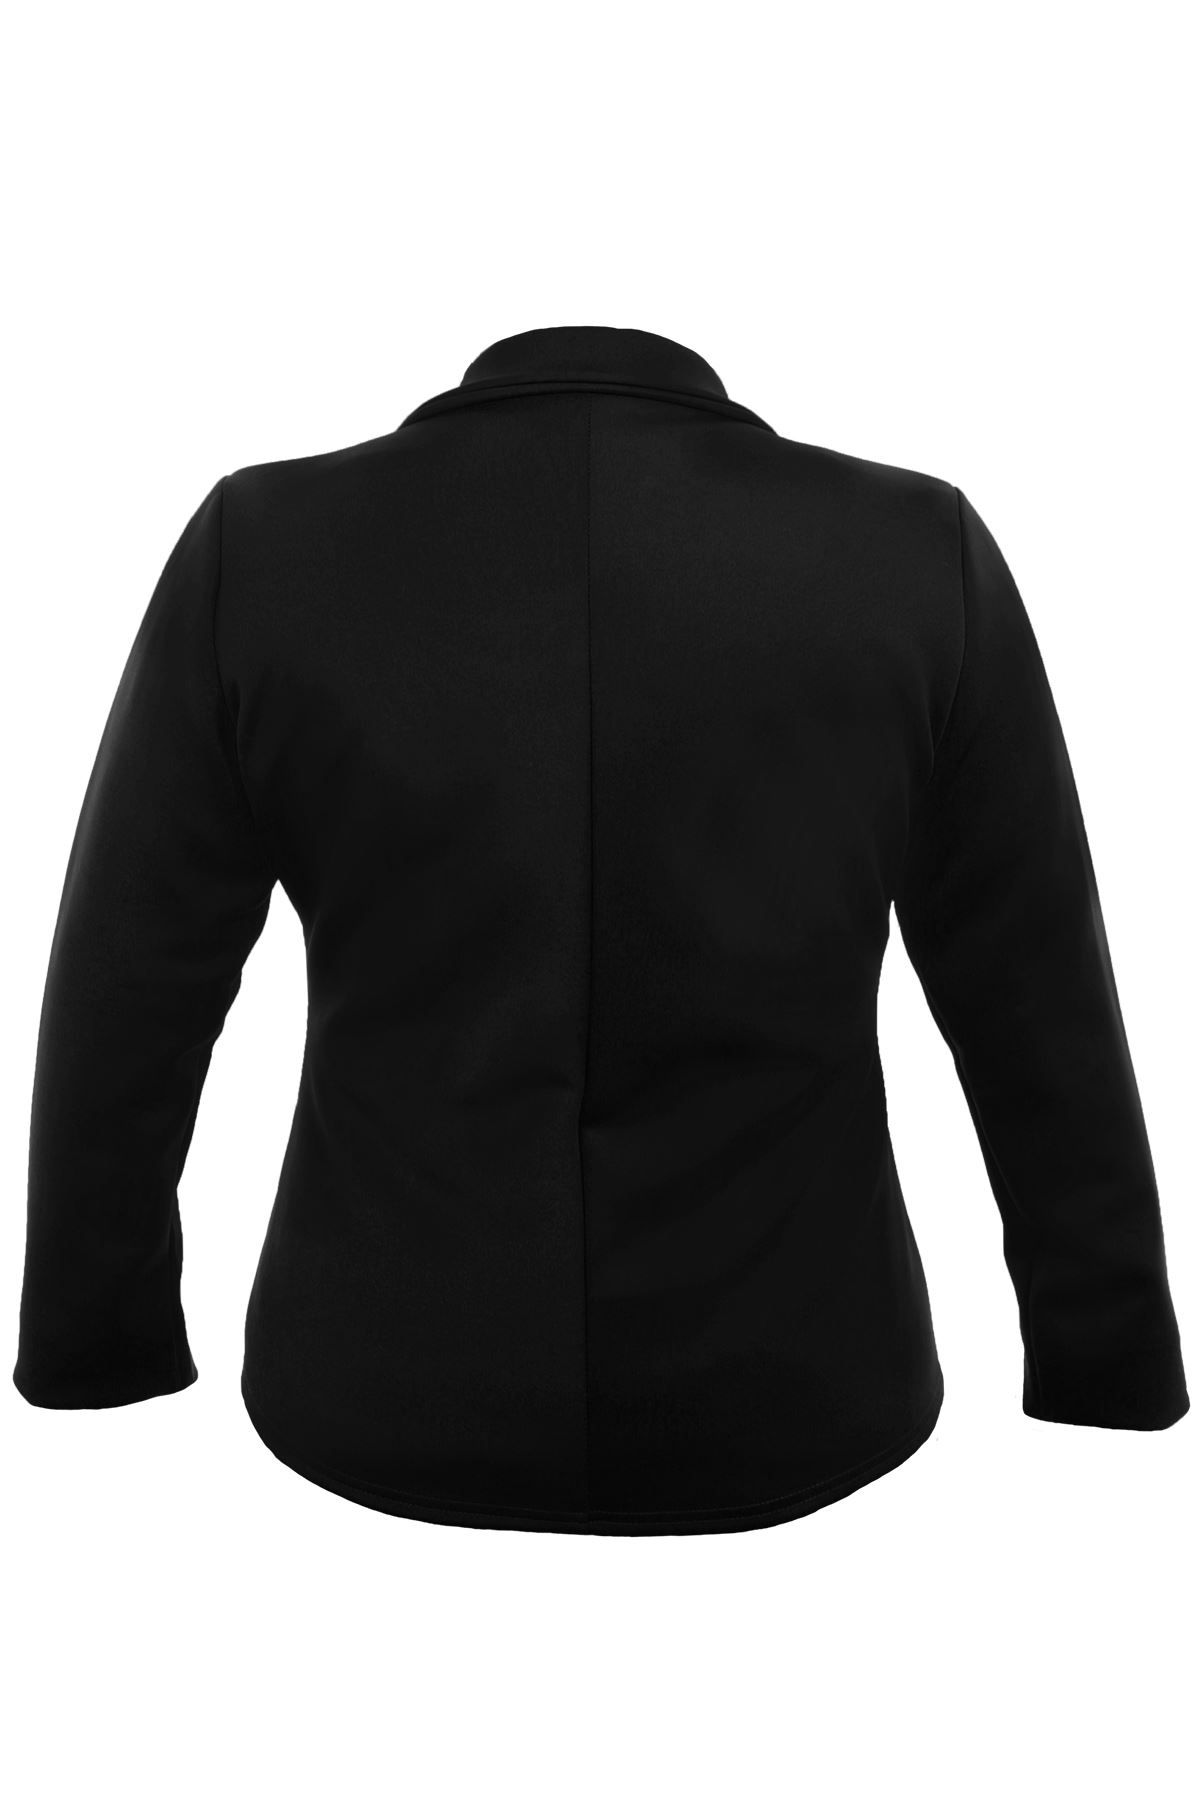 Ladies Plus Size Collared V Neck Zip Front Women's Smart ...